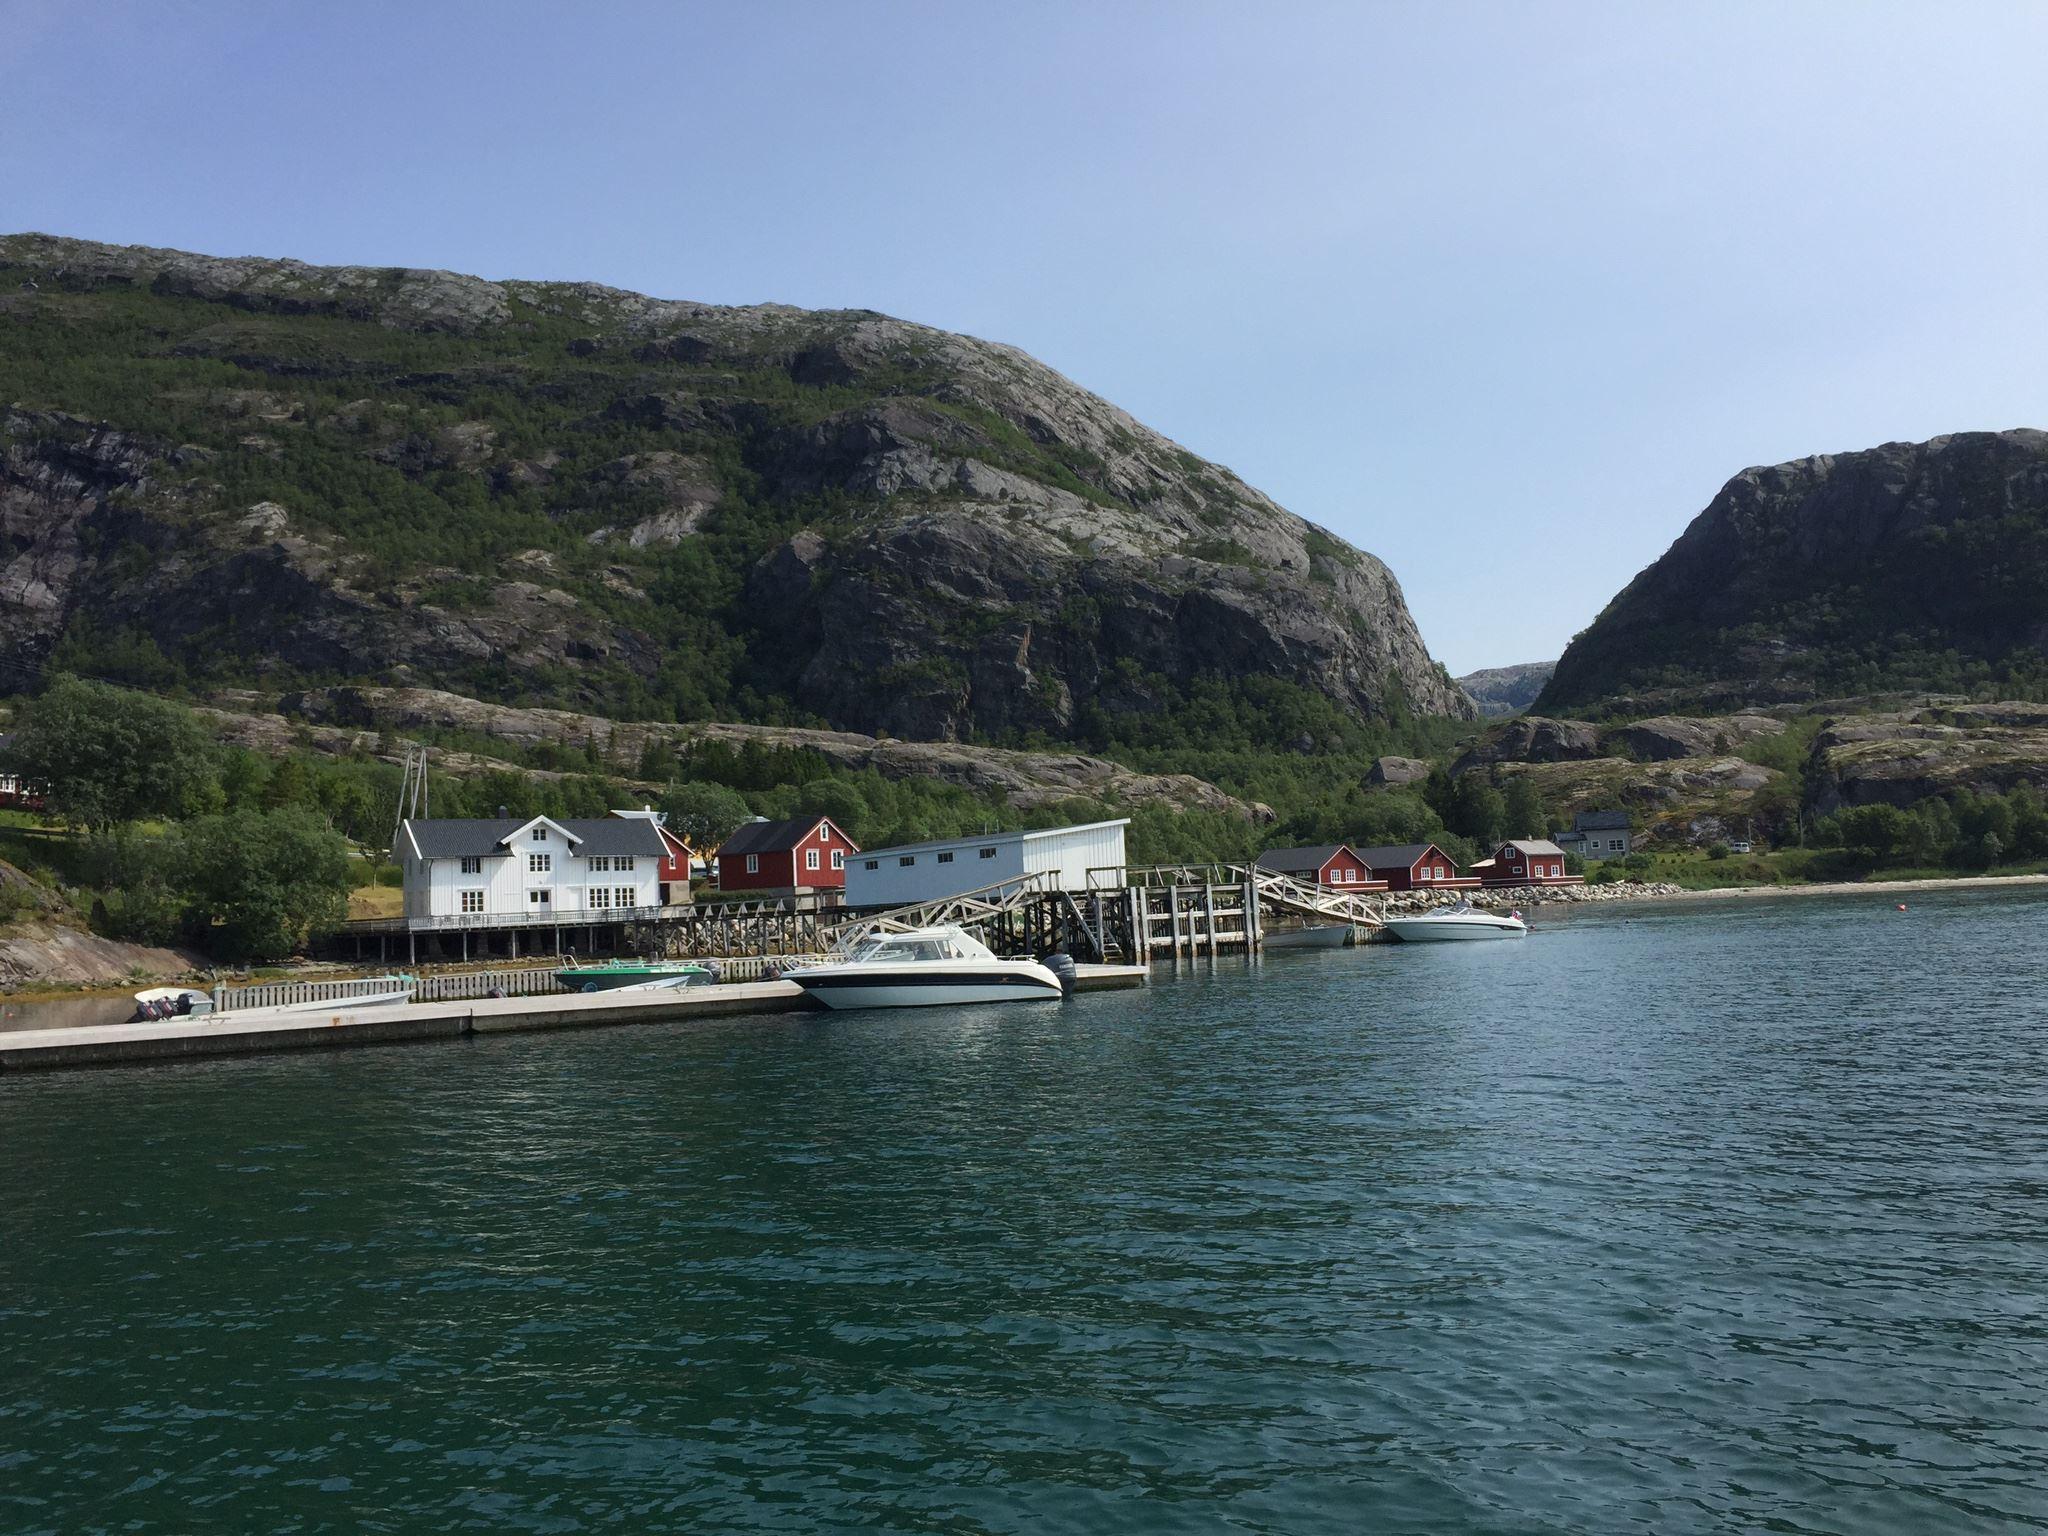 Visthus Rorbucamping,  © Visthus Rorbucamping, Visthus Rorbucamping ved Vistenfjorden